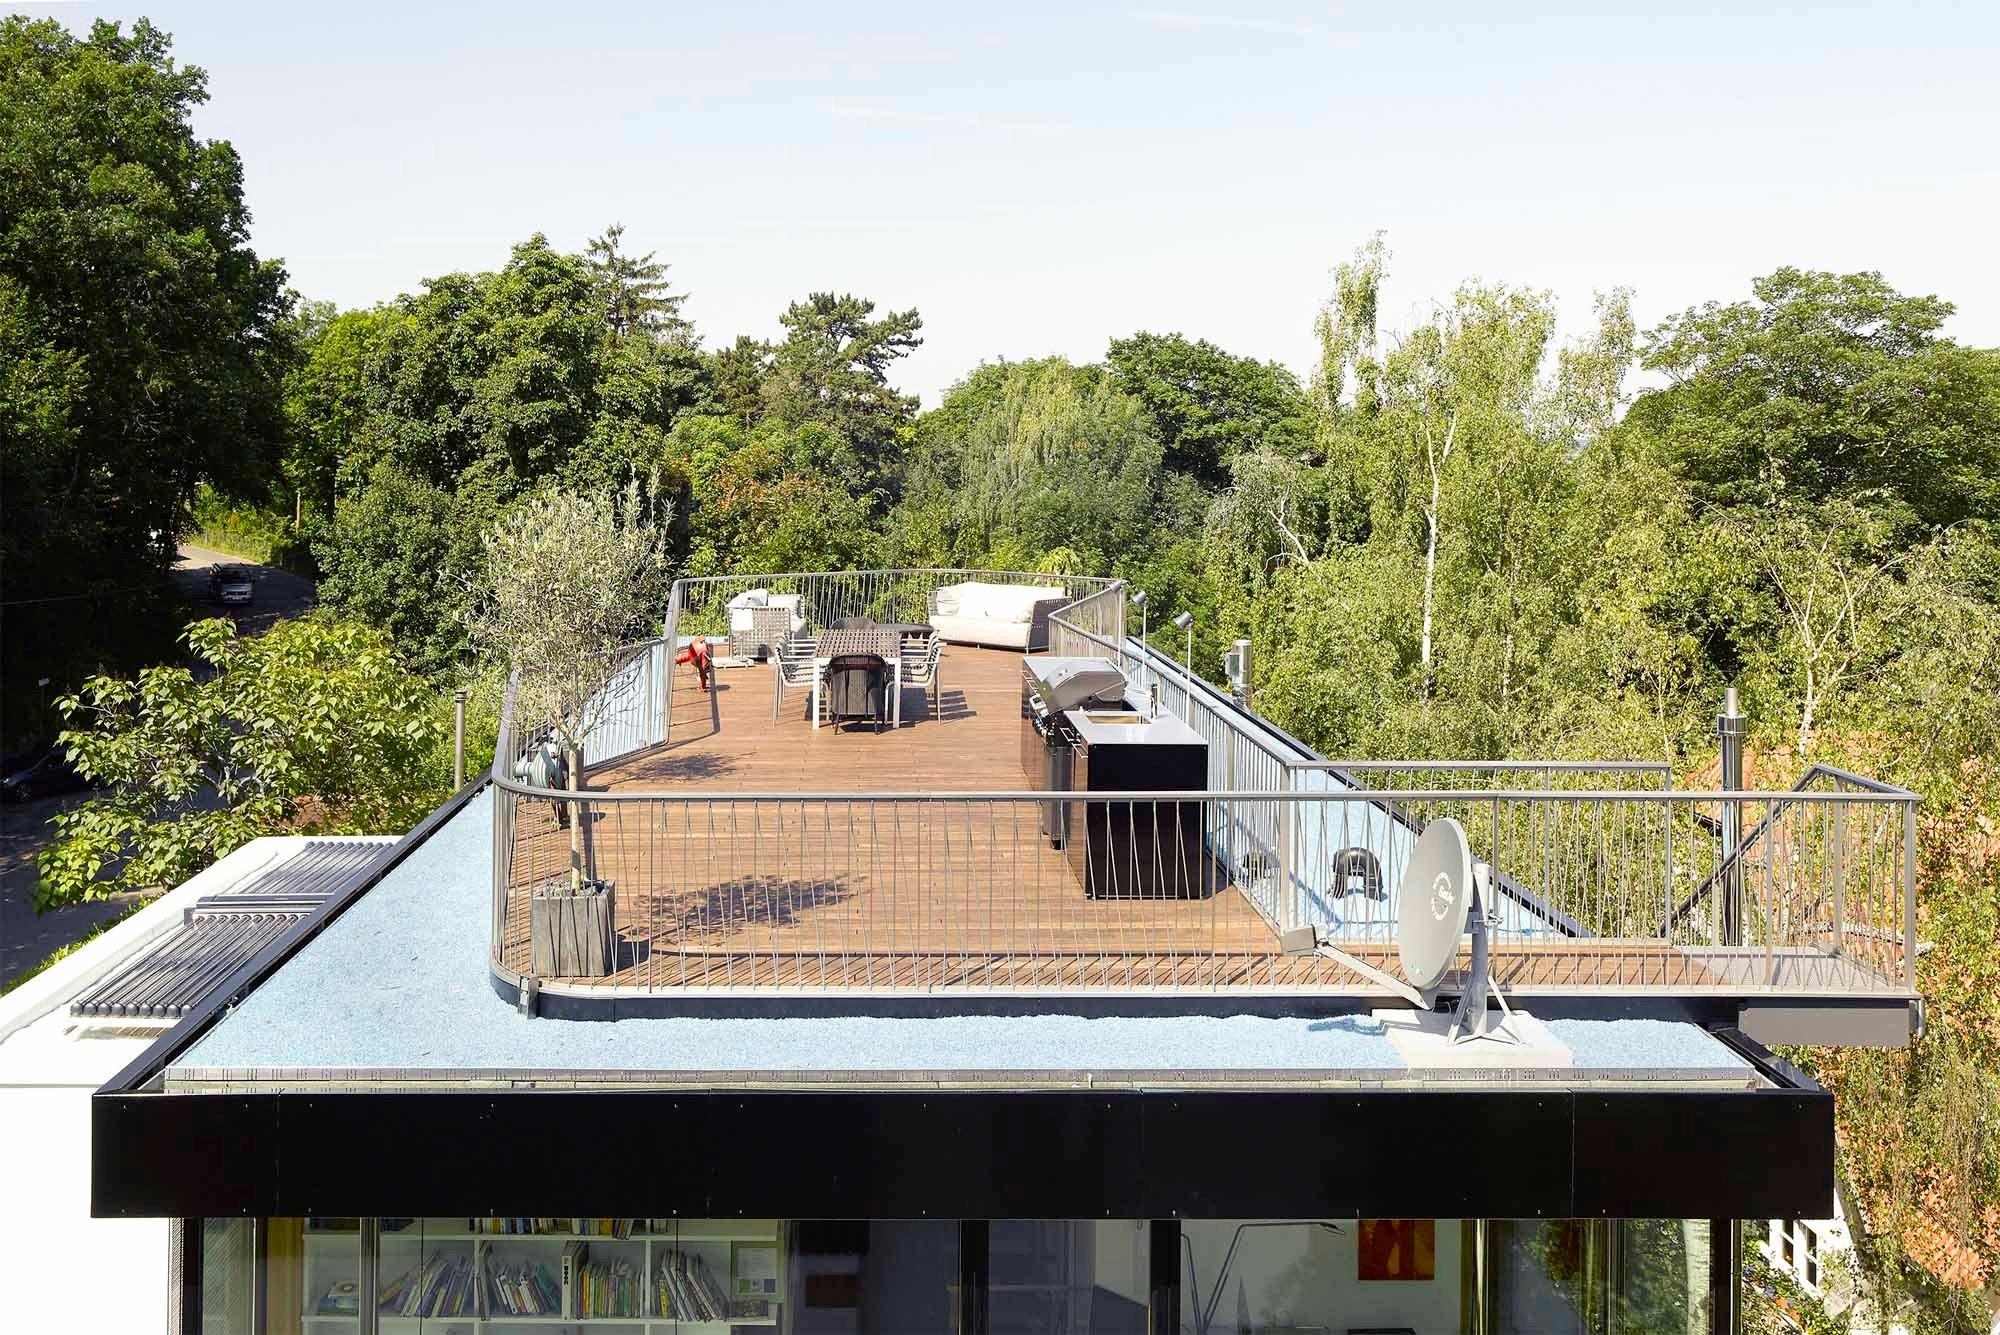 Haus Mit Dachterrasse Haus Mit Dachterrasse Schw Rerhaus Ihr